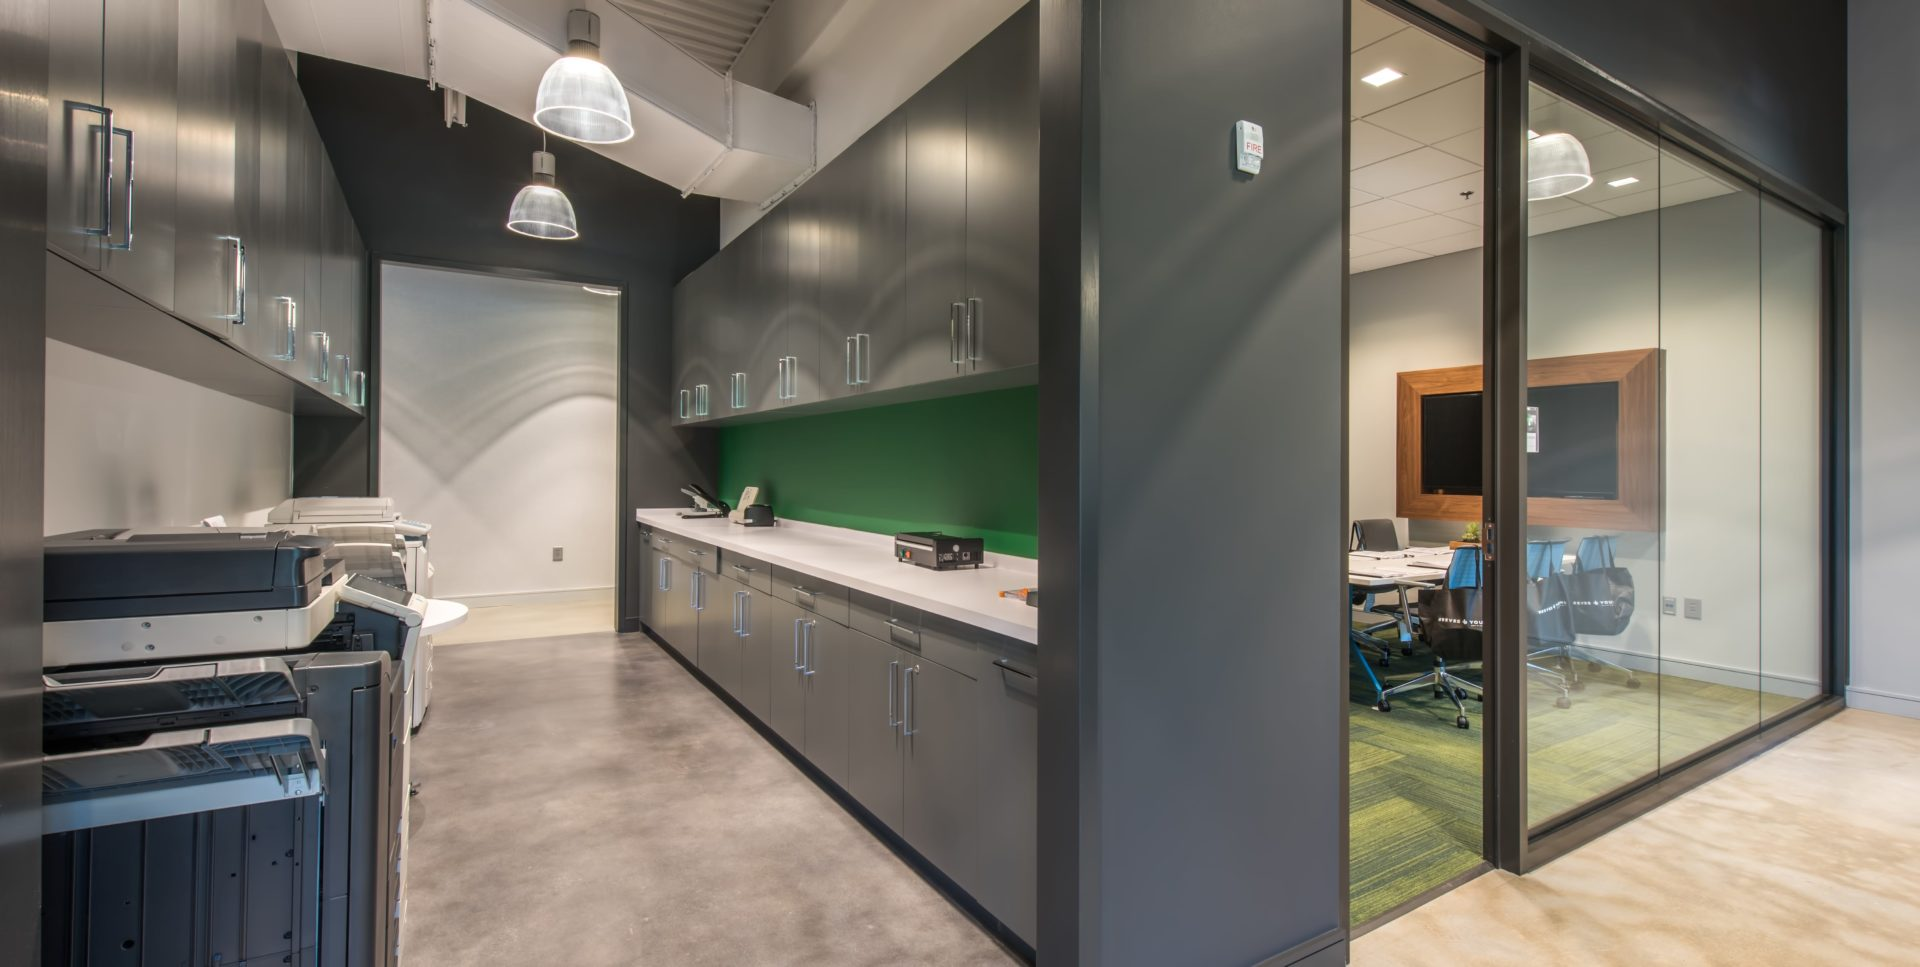 Stone Flooring and Grey Walls in Employee Break Area